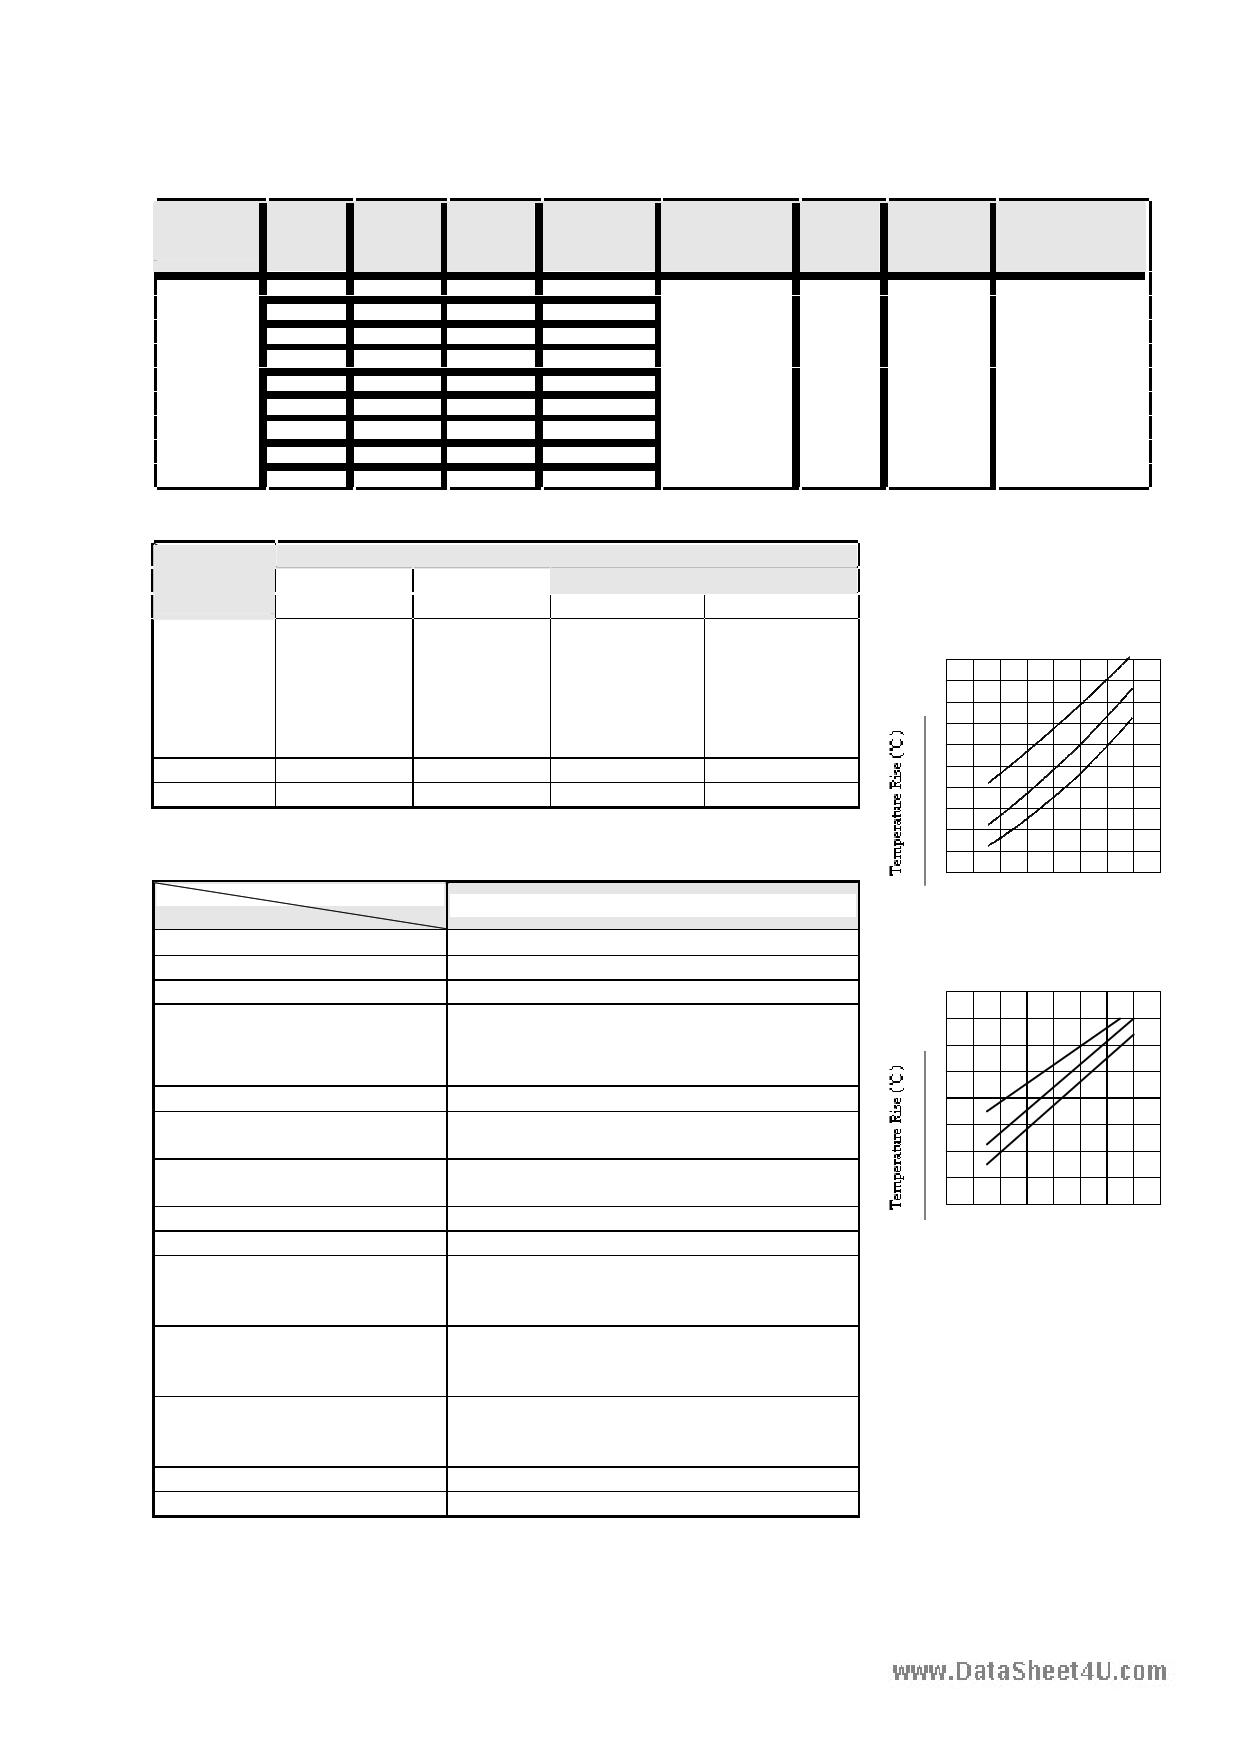 SLA-05VDC-S-L-C pdf schematic